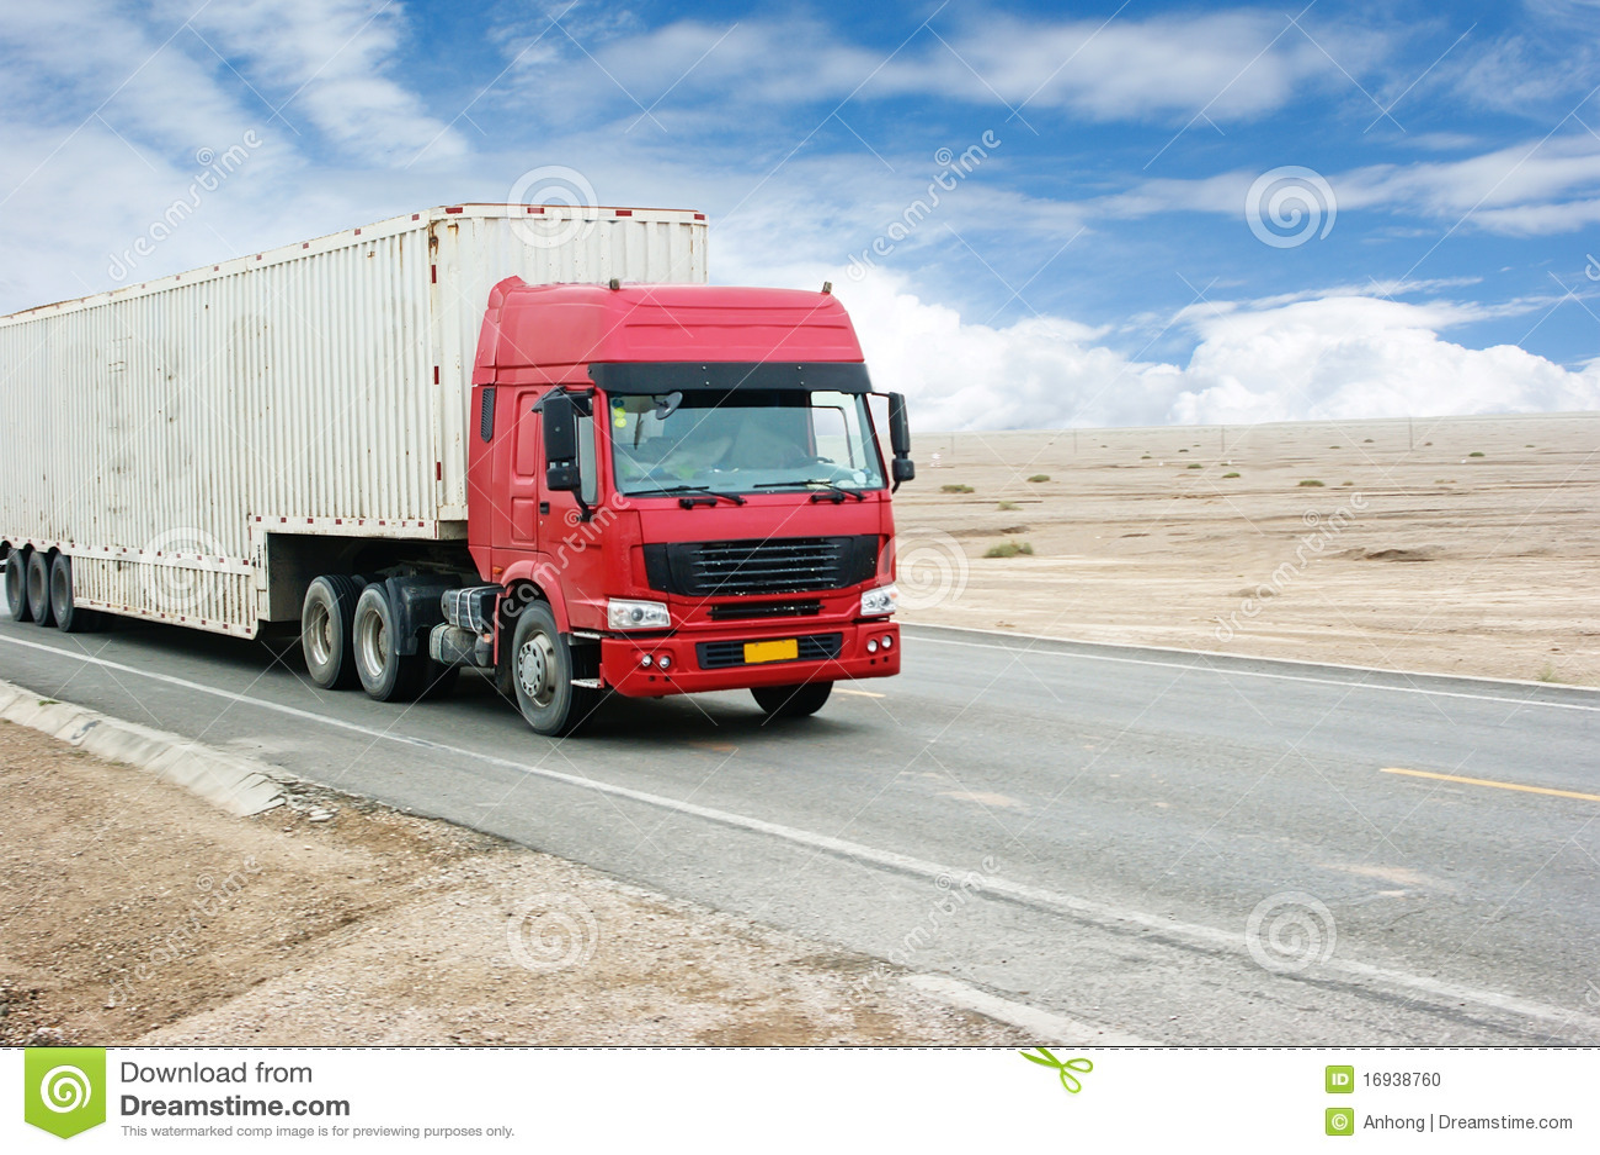 Transport Truck Stock Photo. Image Of Remote, Gobi, Cargo